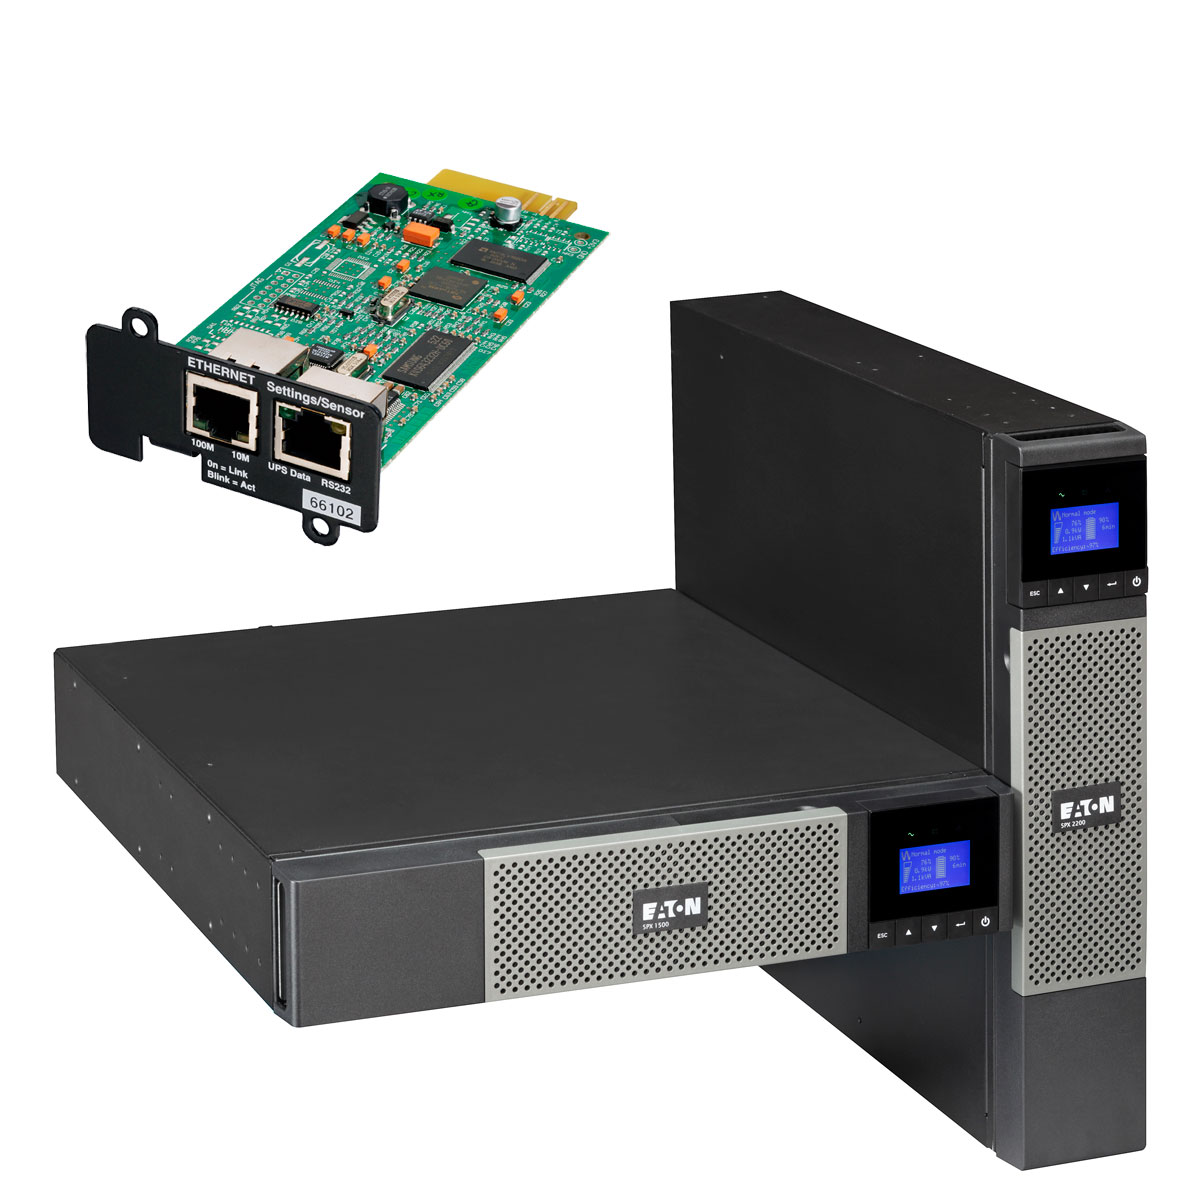 Onduleur Eaton 5PX 3000i RT2U Netpack Eaton 5PX 3000i RT2U Netpack - Onduleur Line interactive USB/Série 3000VA 2700W (Tour/Rack 2U)